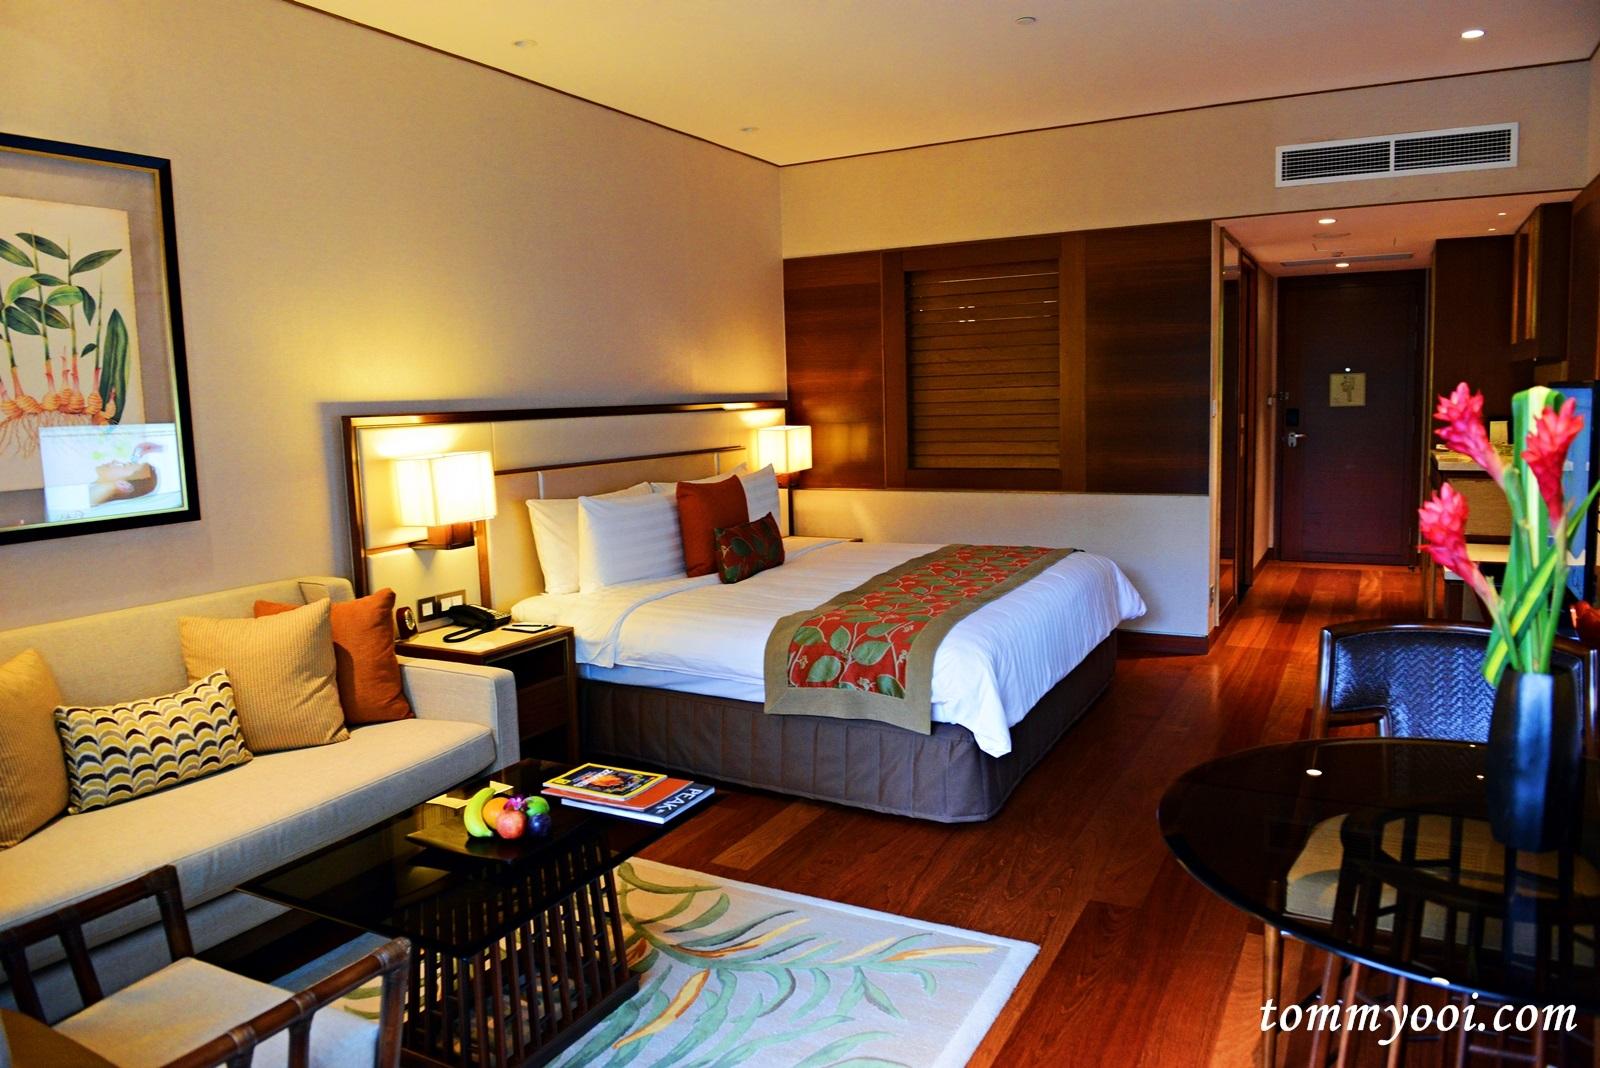 Shangri La Hotel Singapore - Tommy Ooi Travel Guide